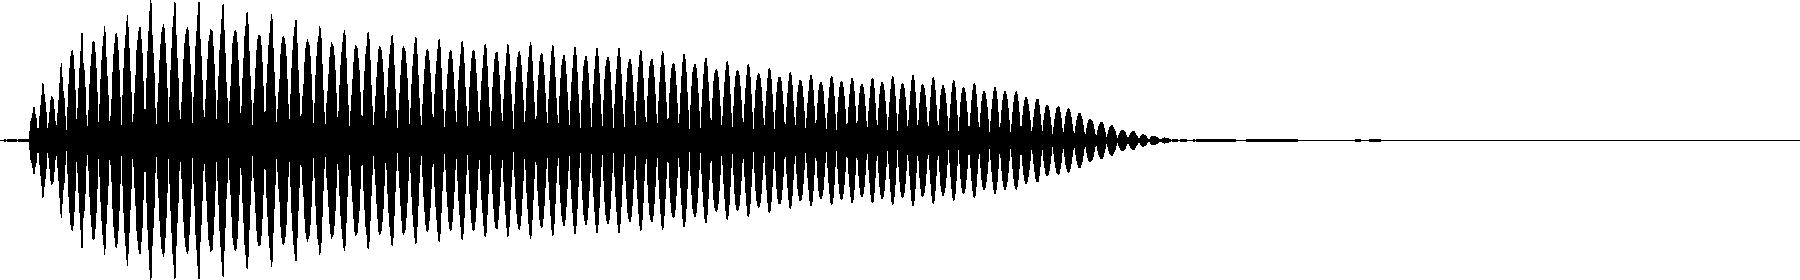 alvinspk72